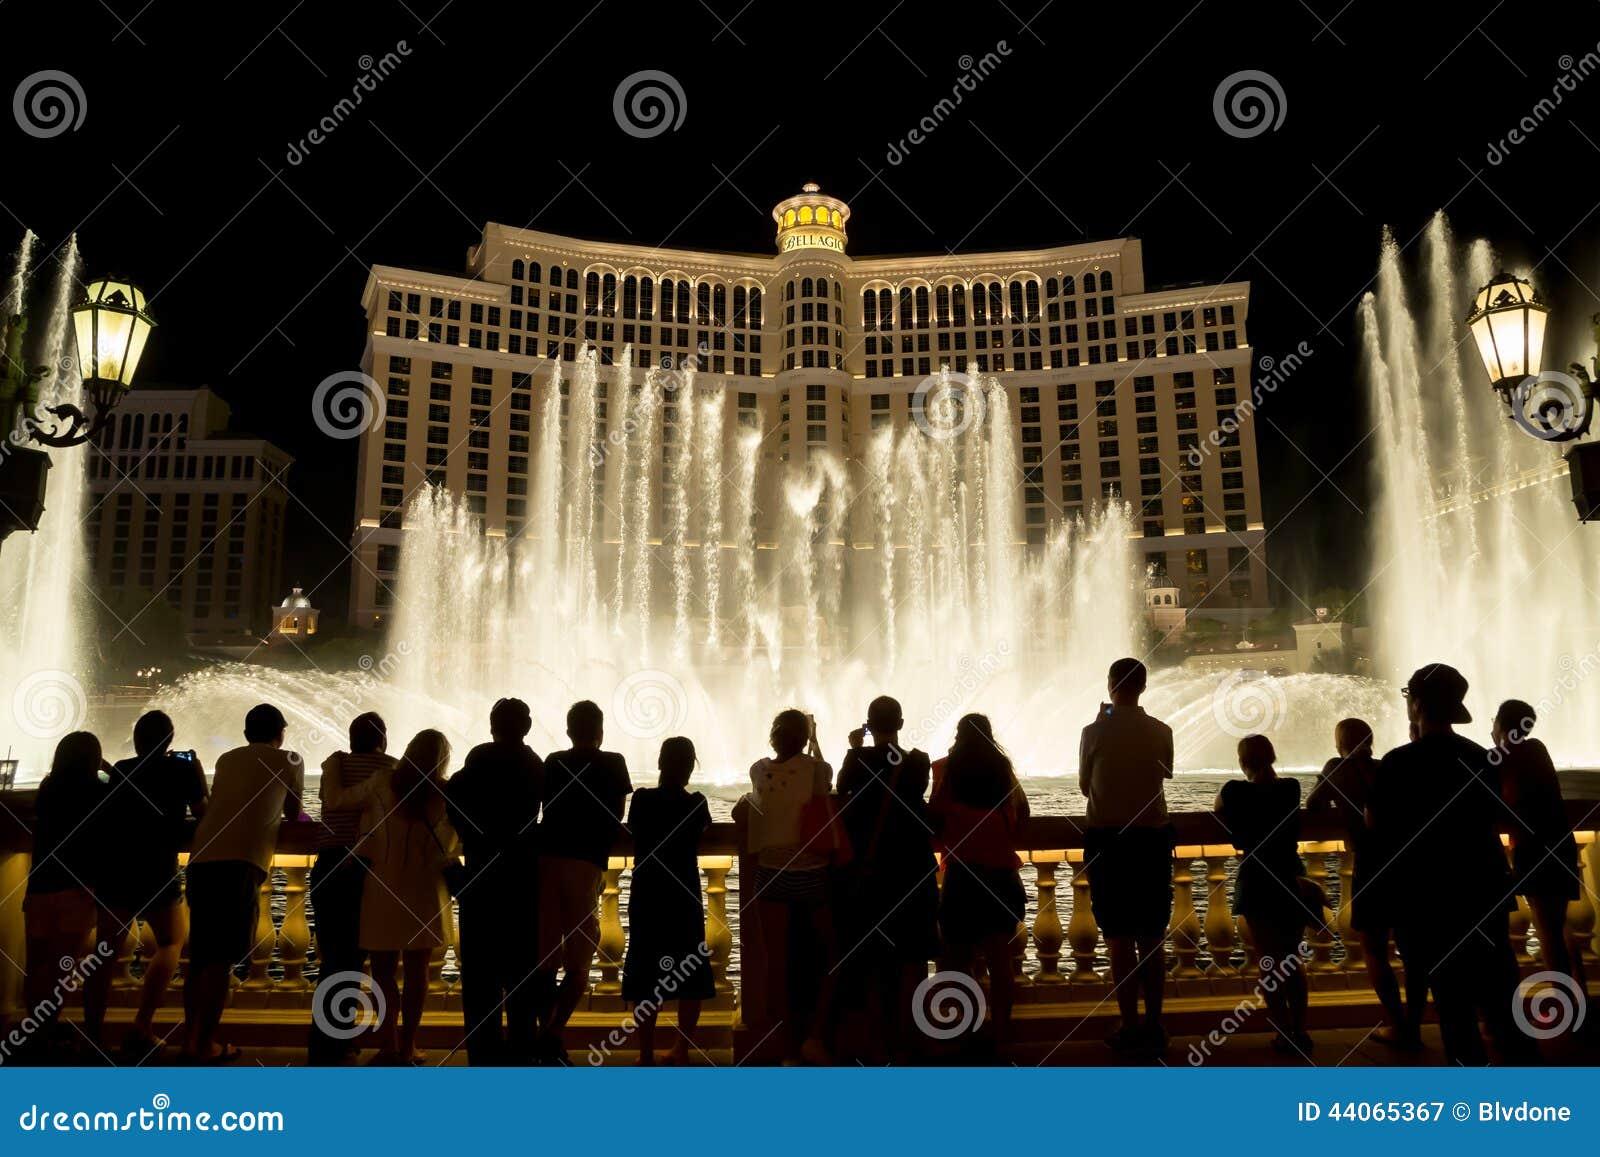 Las Vegas Bellagio Hotel water fountain